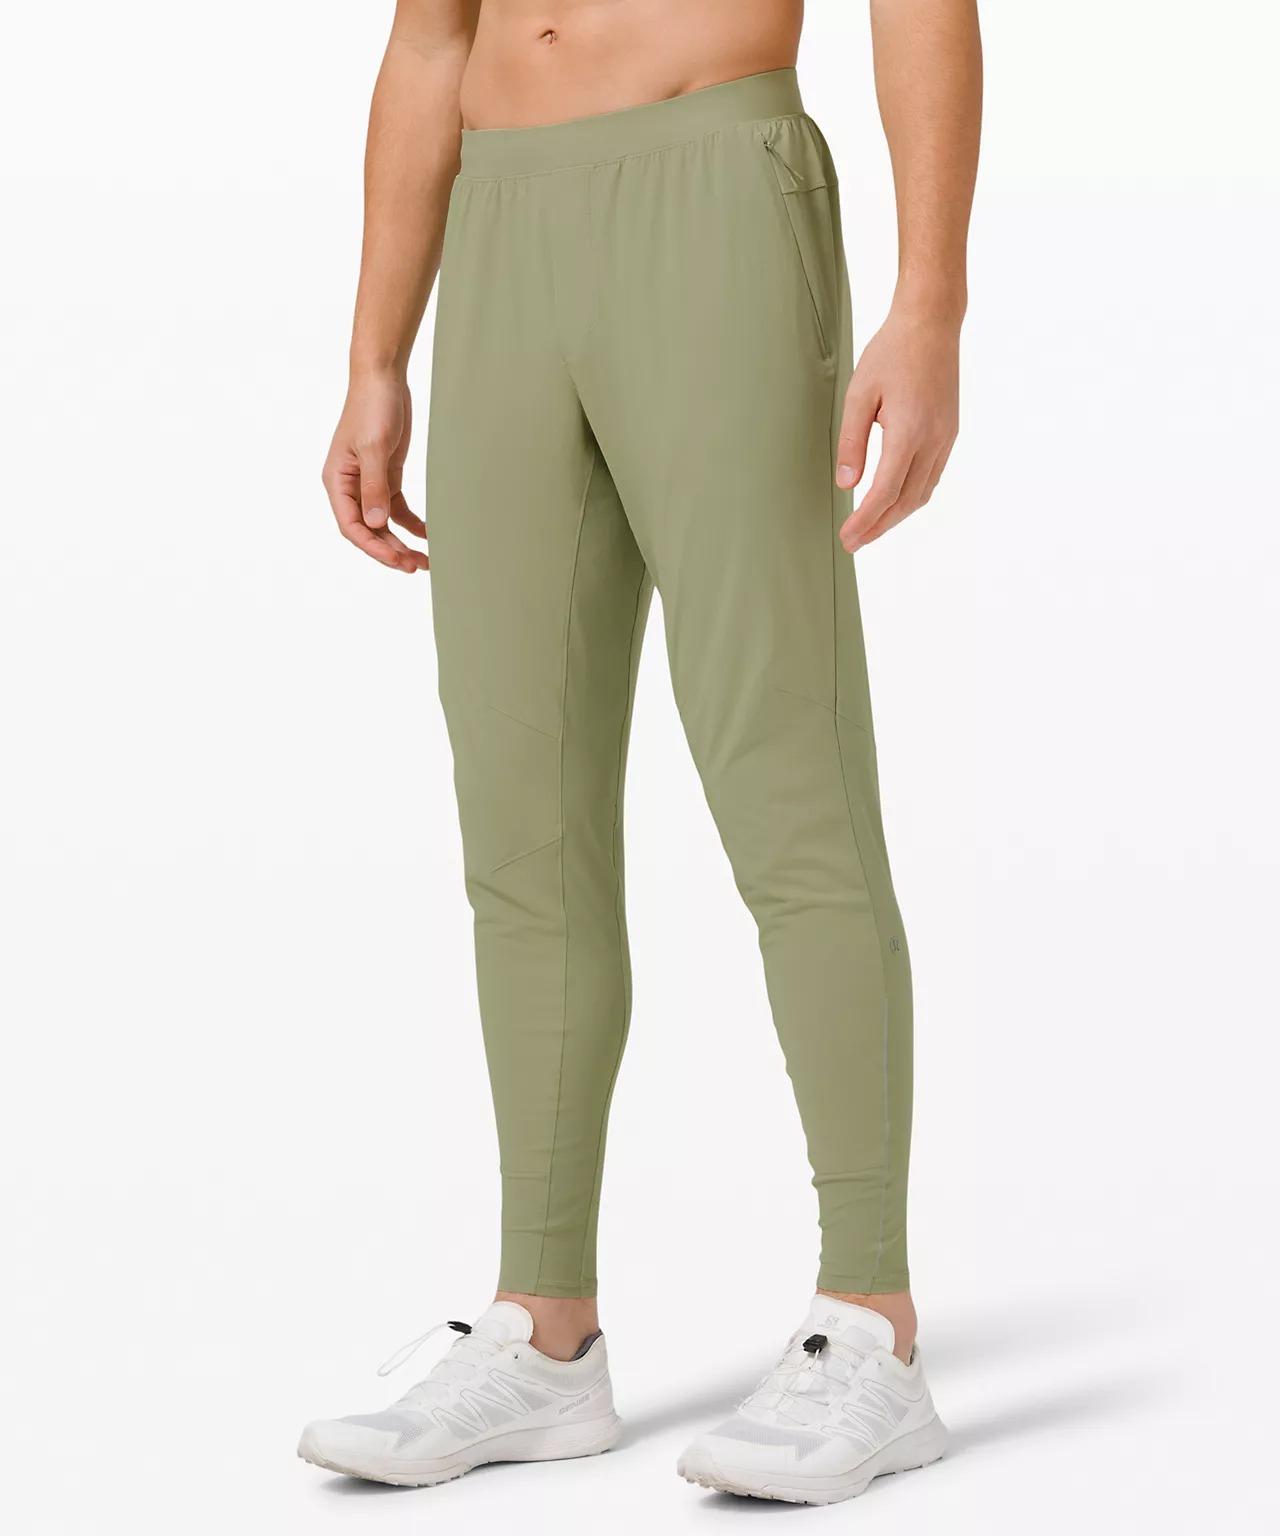 Surge Hybrid Pant